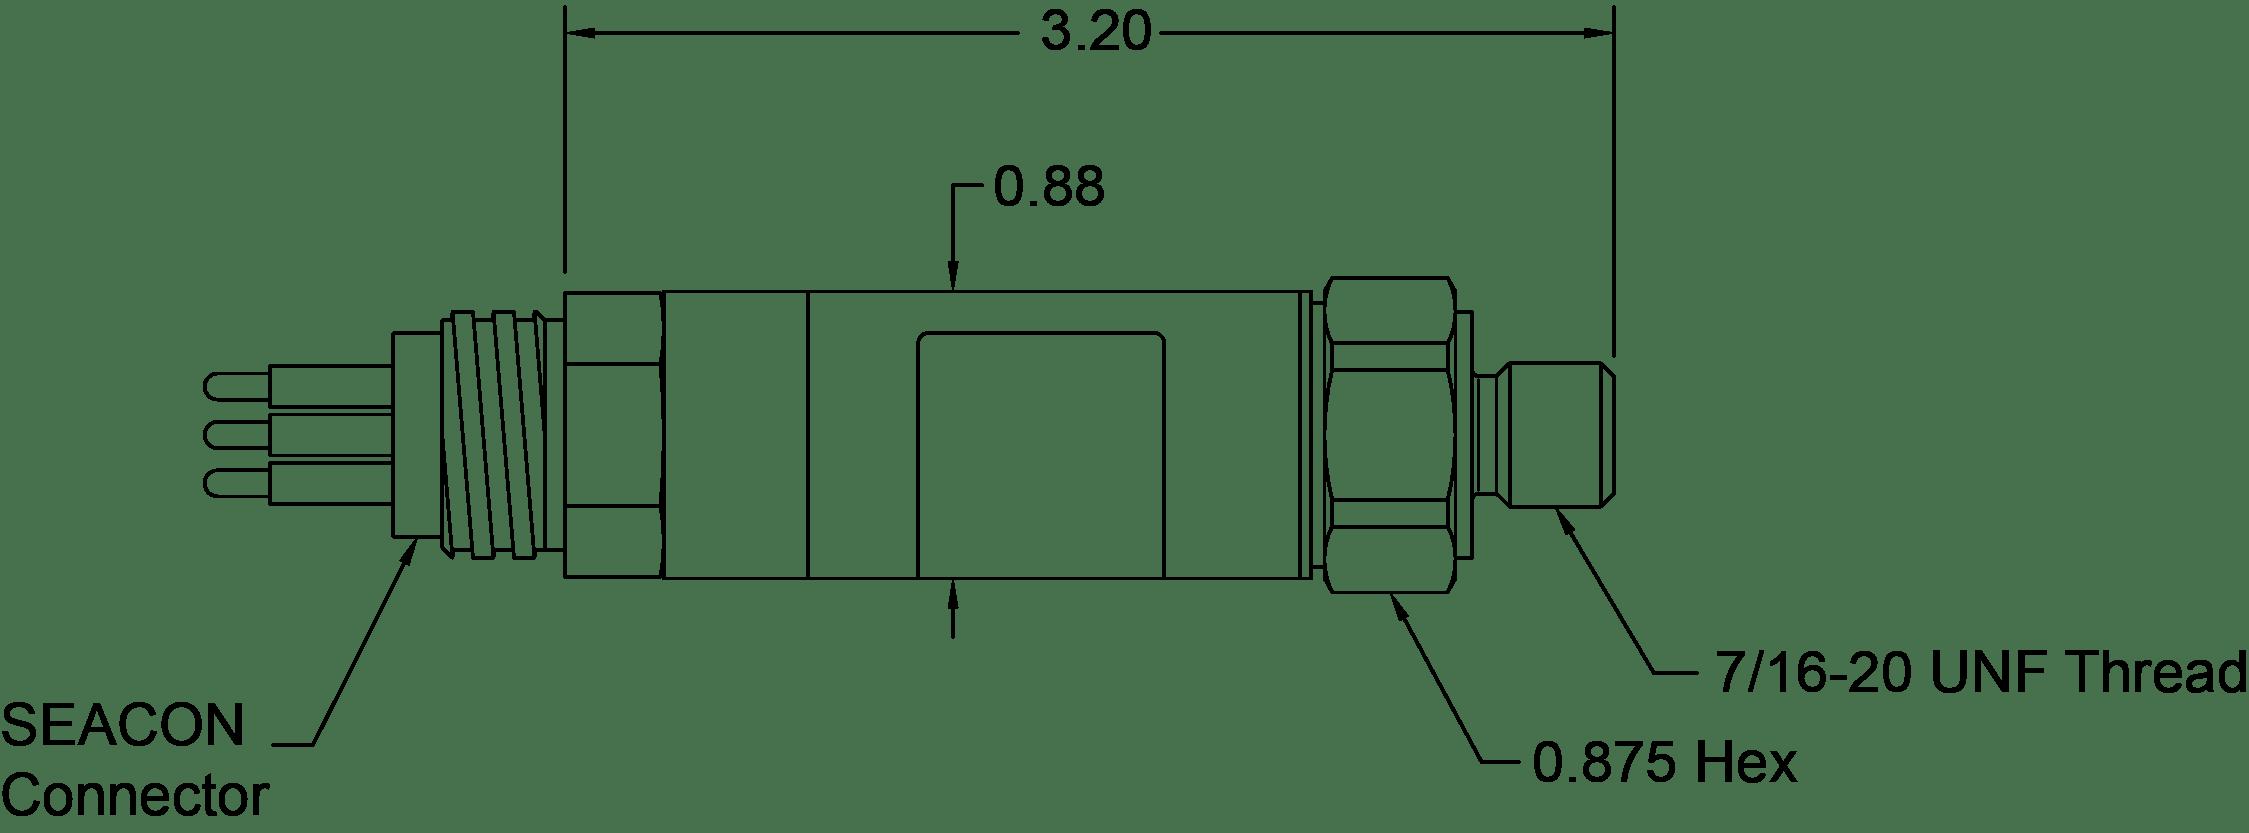 Rov Pressure Transducers